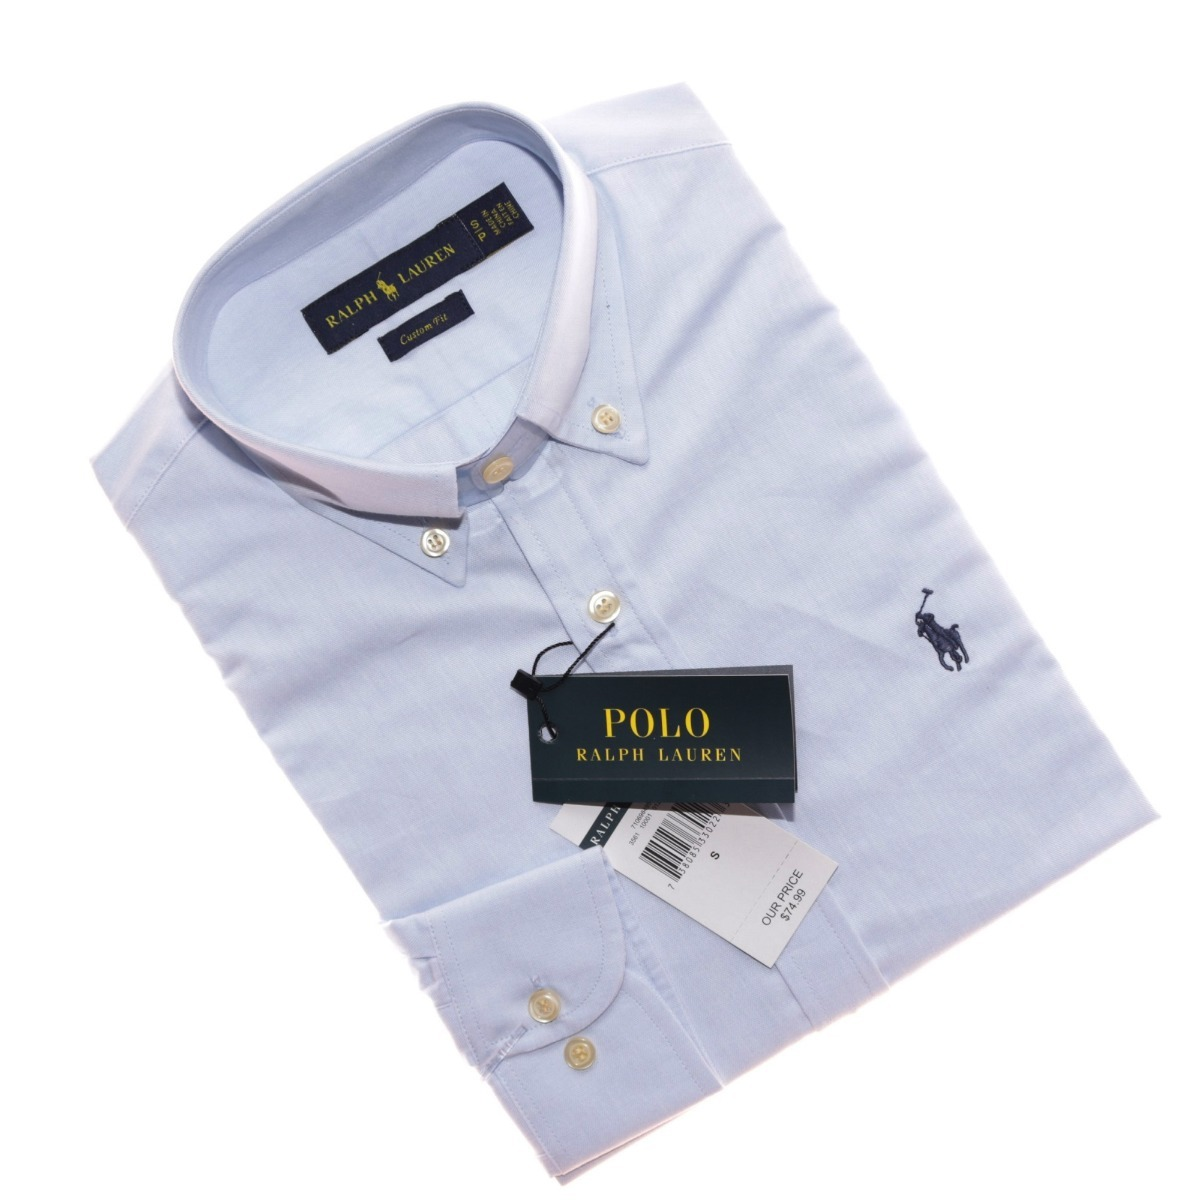 camisa social ralph lauren oxford azul claro cs fit original. Carregando  zoom. a6adb327c4b